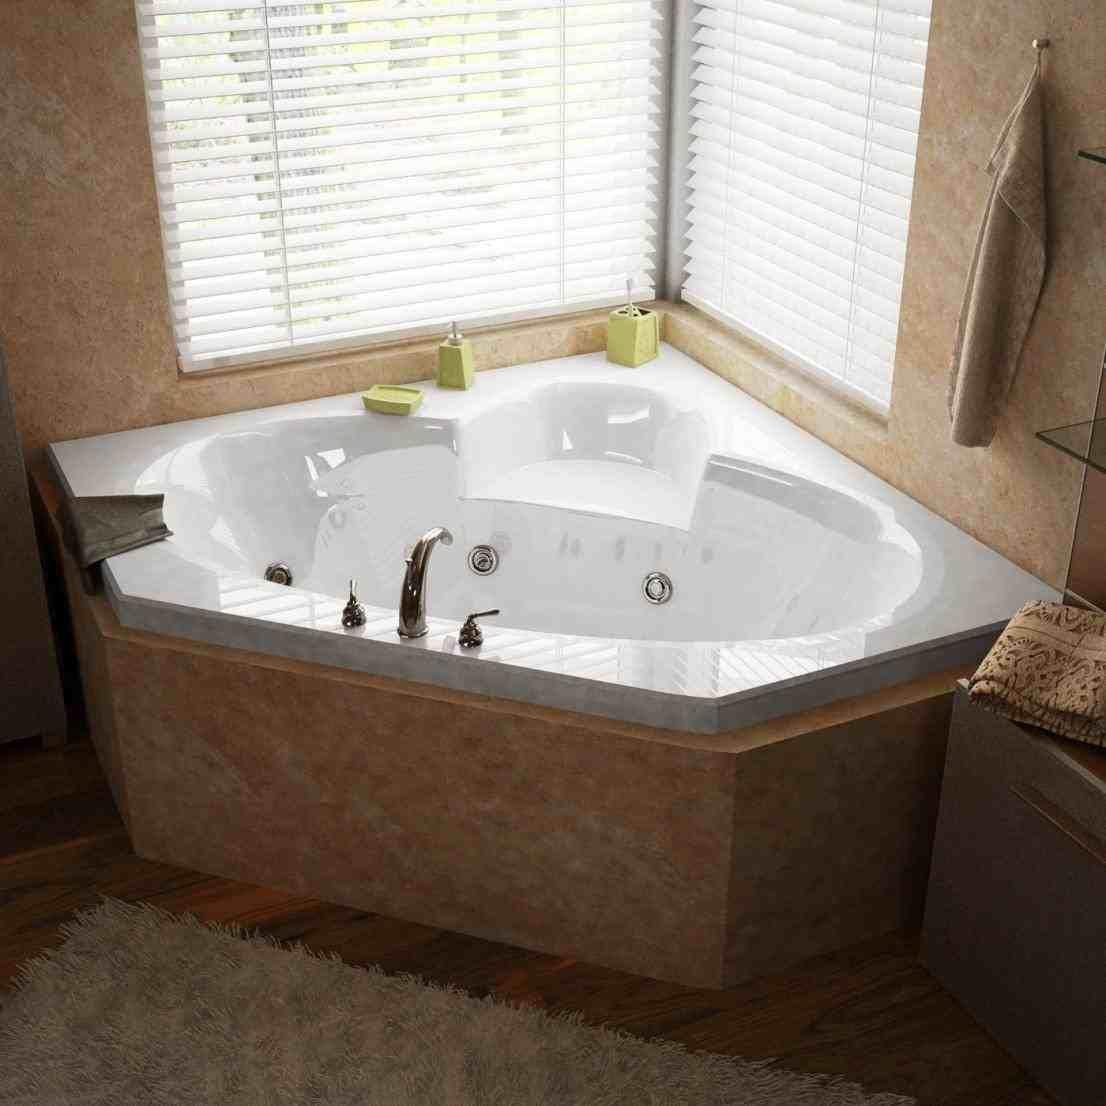 New post small jacuzzi bathtub visit bathroomremodelideass club